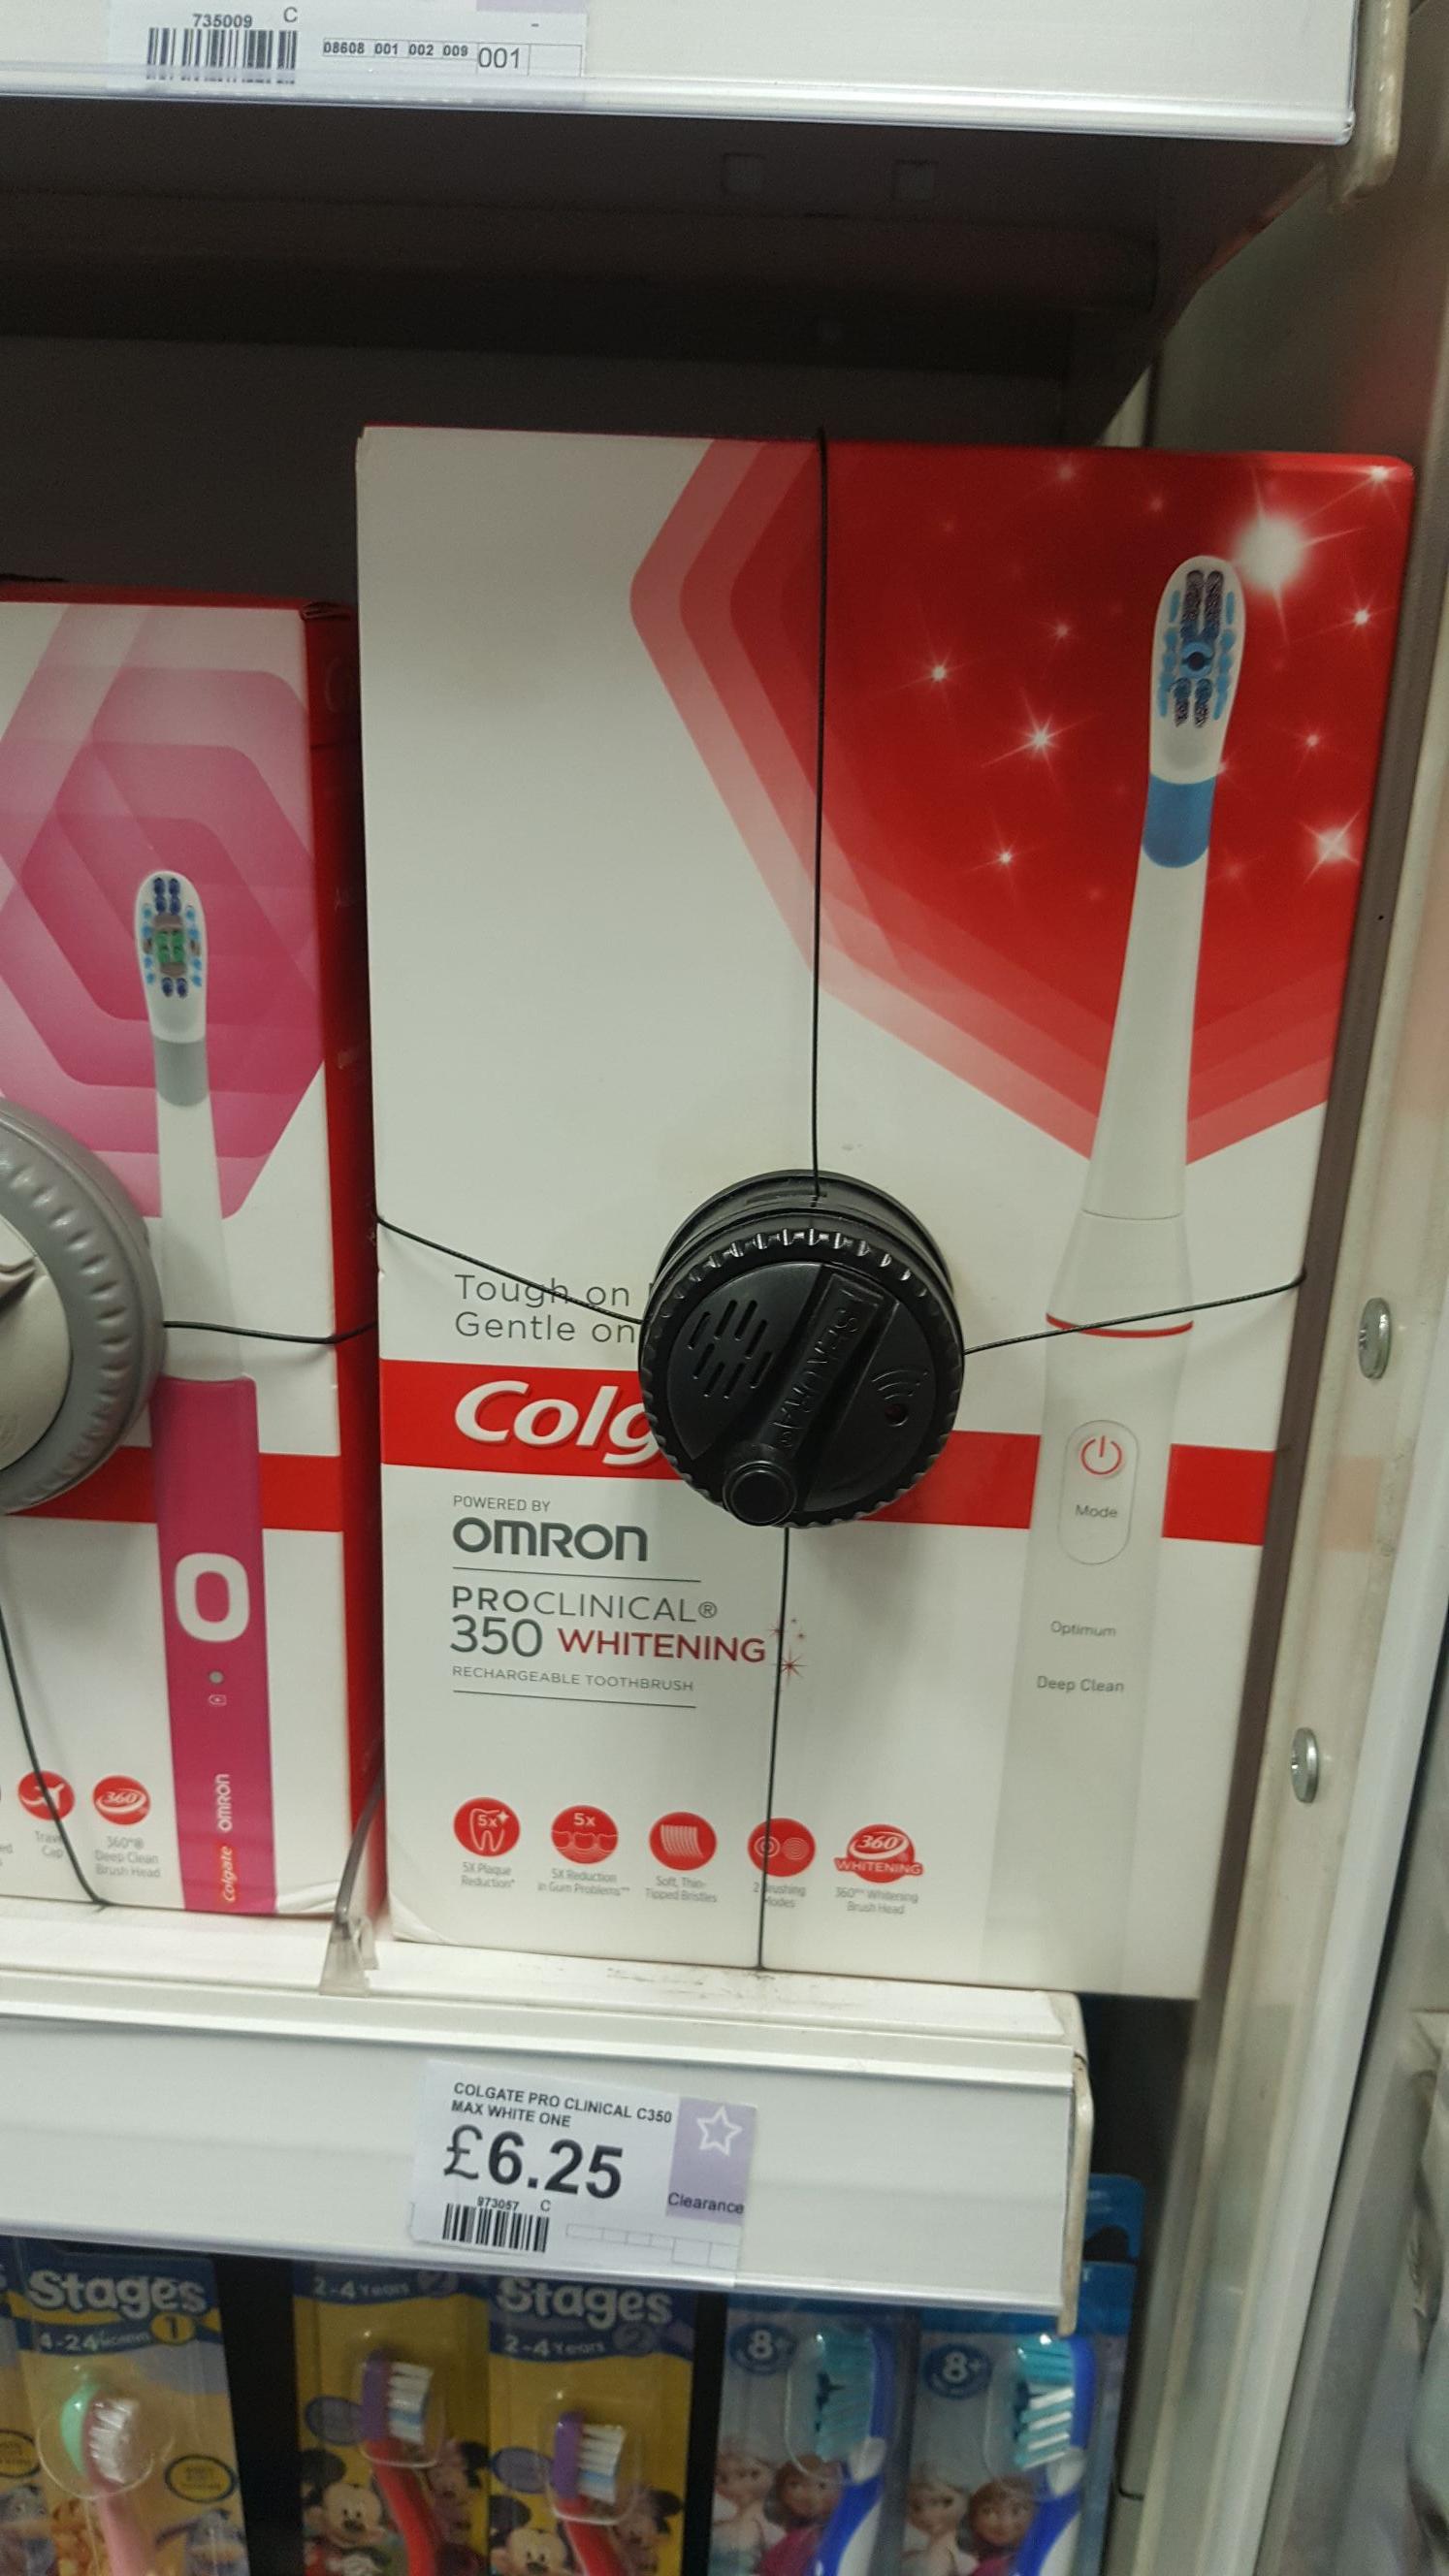 Colgate pro clinical 350c £6.25 @ Superdrug instore - Harleden & shepherd bush stores